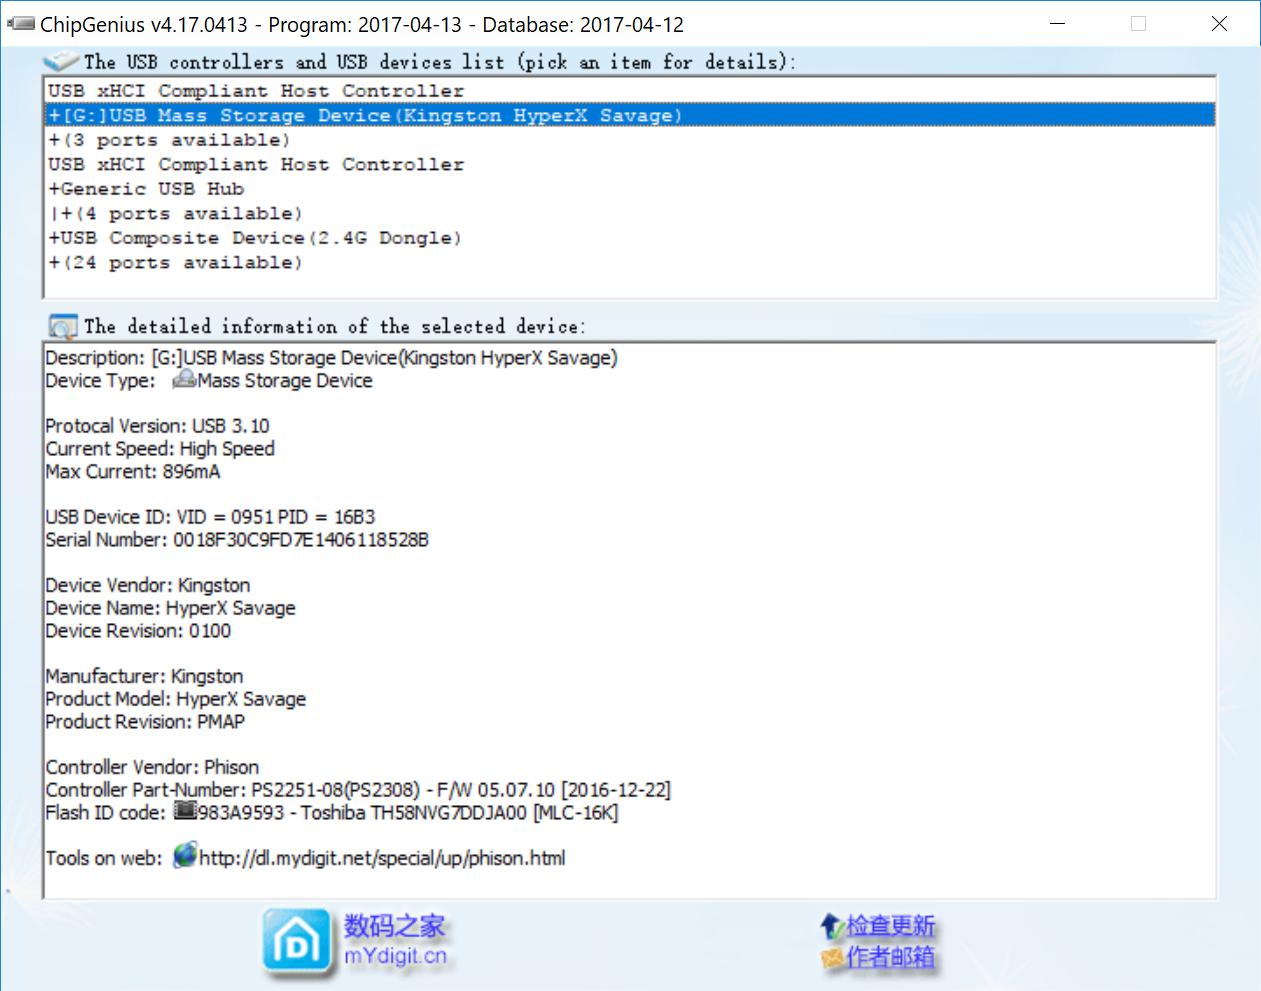 phison ps2307 файлы прошивки